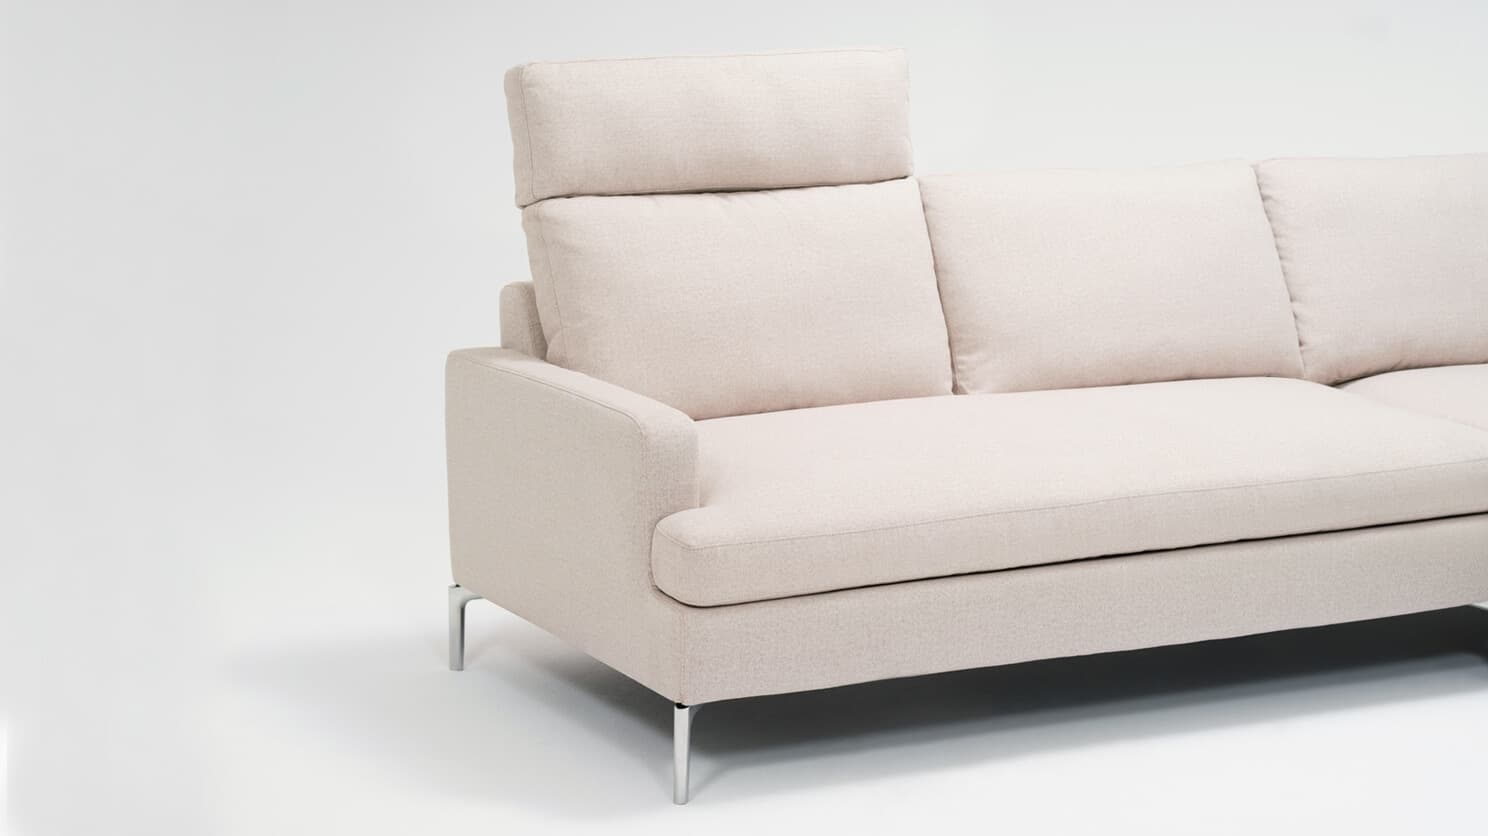 31127 sl sc h 4 sectionals eve 2 piece headrest panama natural